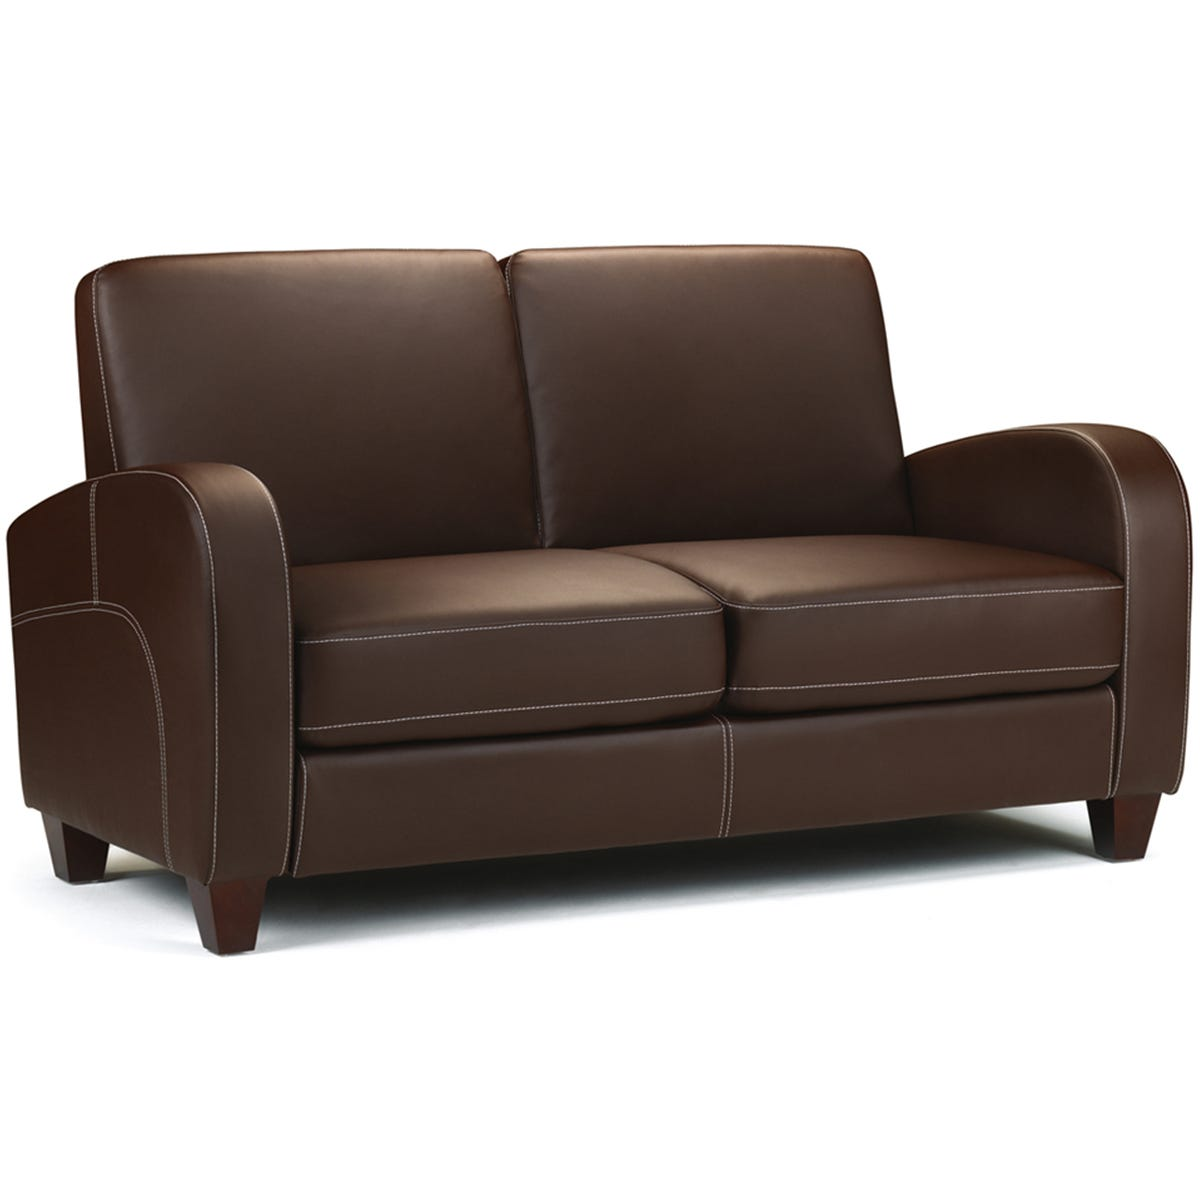 Julian Bowen Vivo 2 Seater Sofa - Chestnut Faux Leather